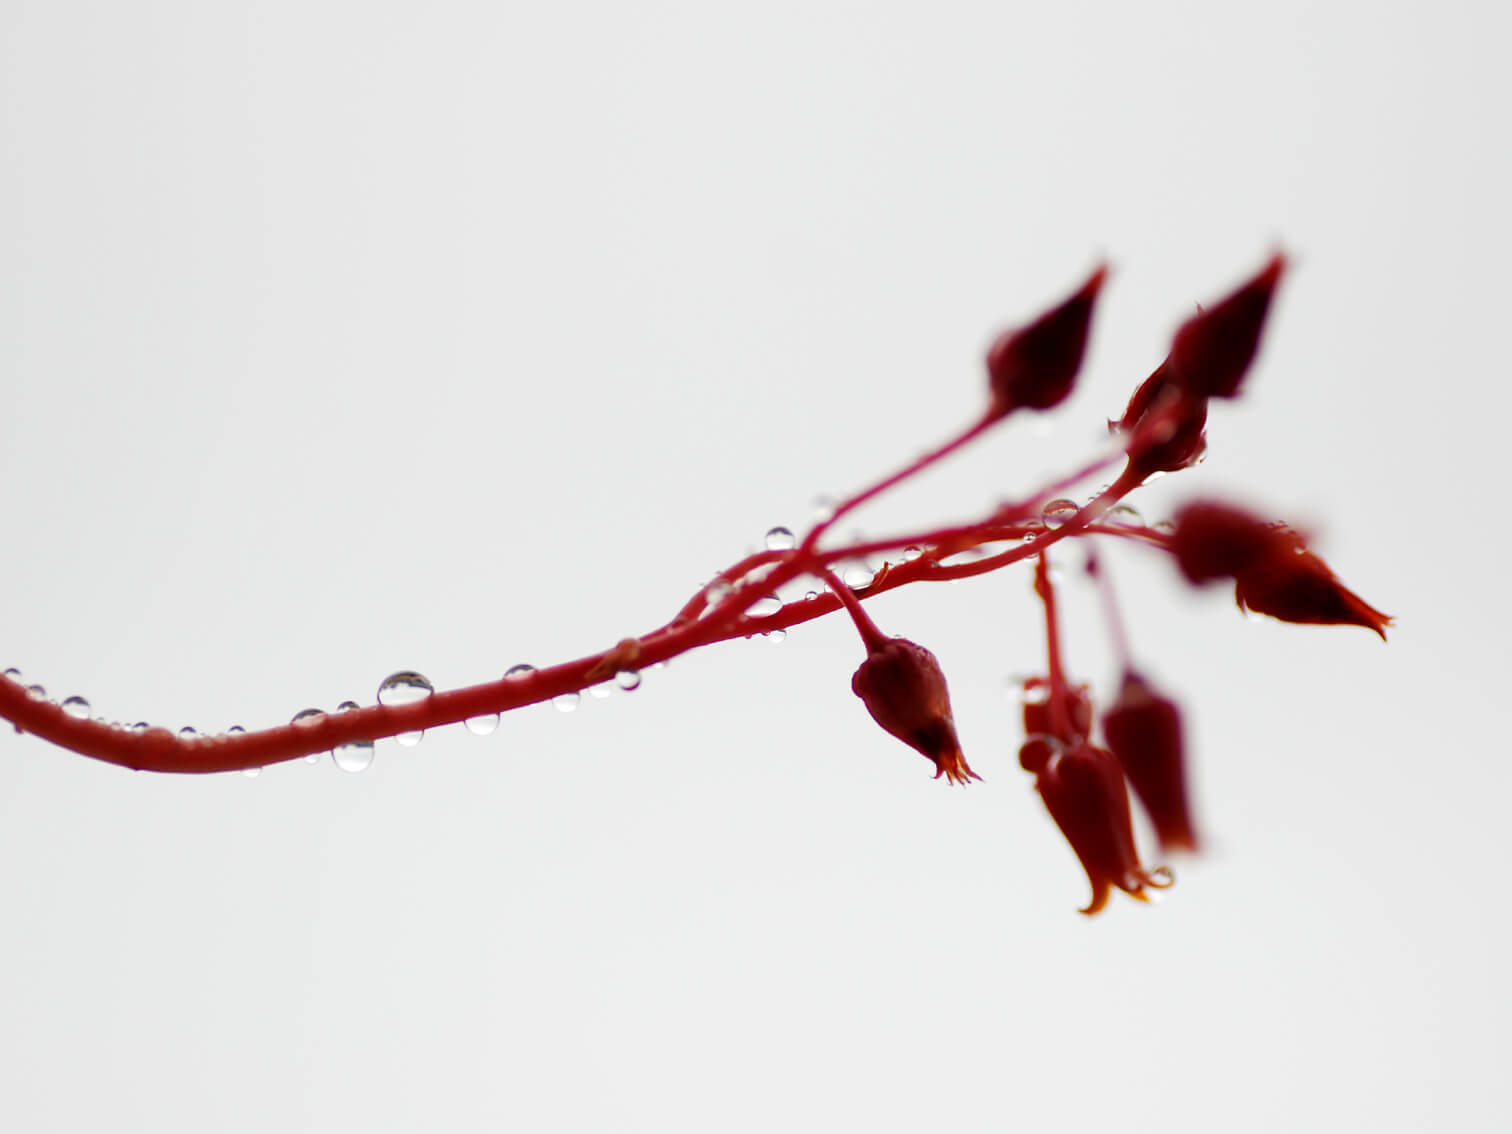 echeveria-chihuahuaensis-06.jpg